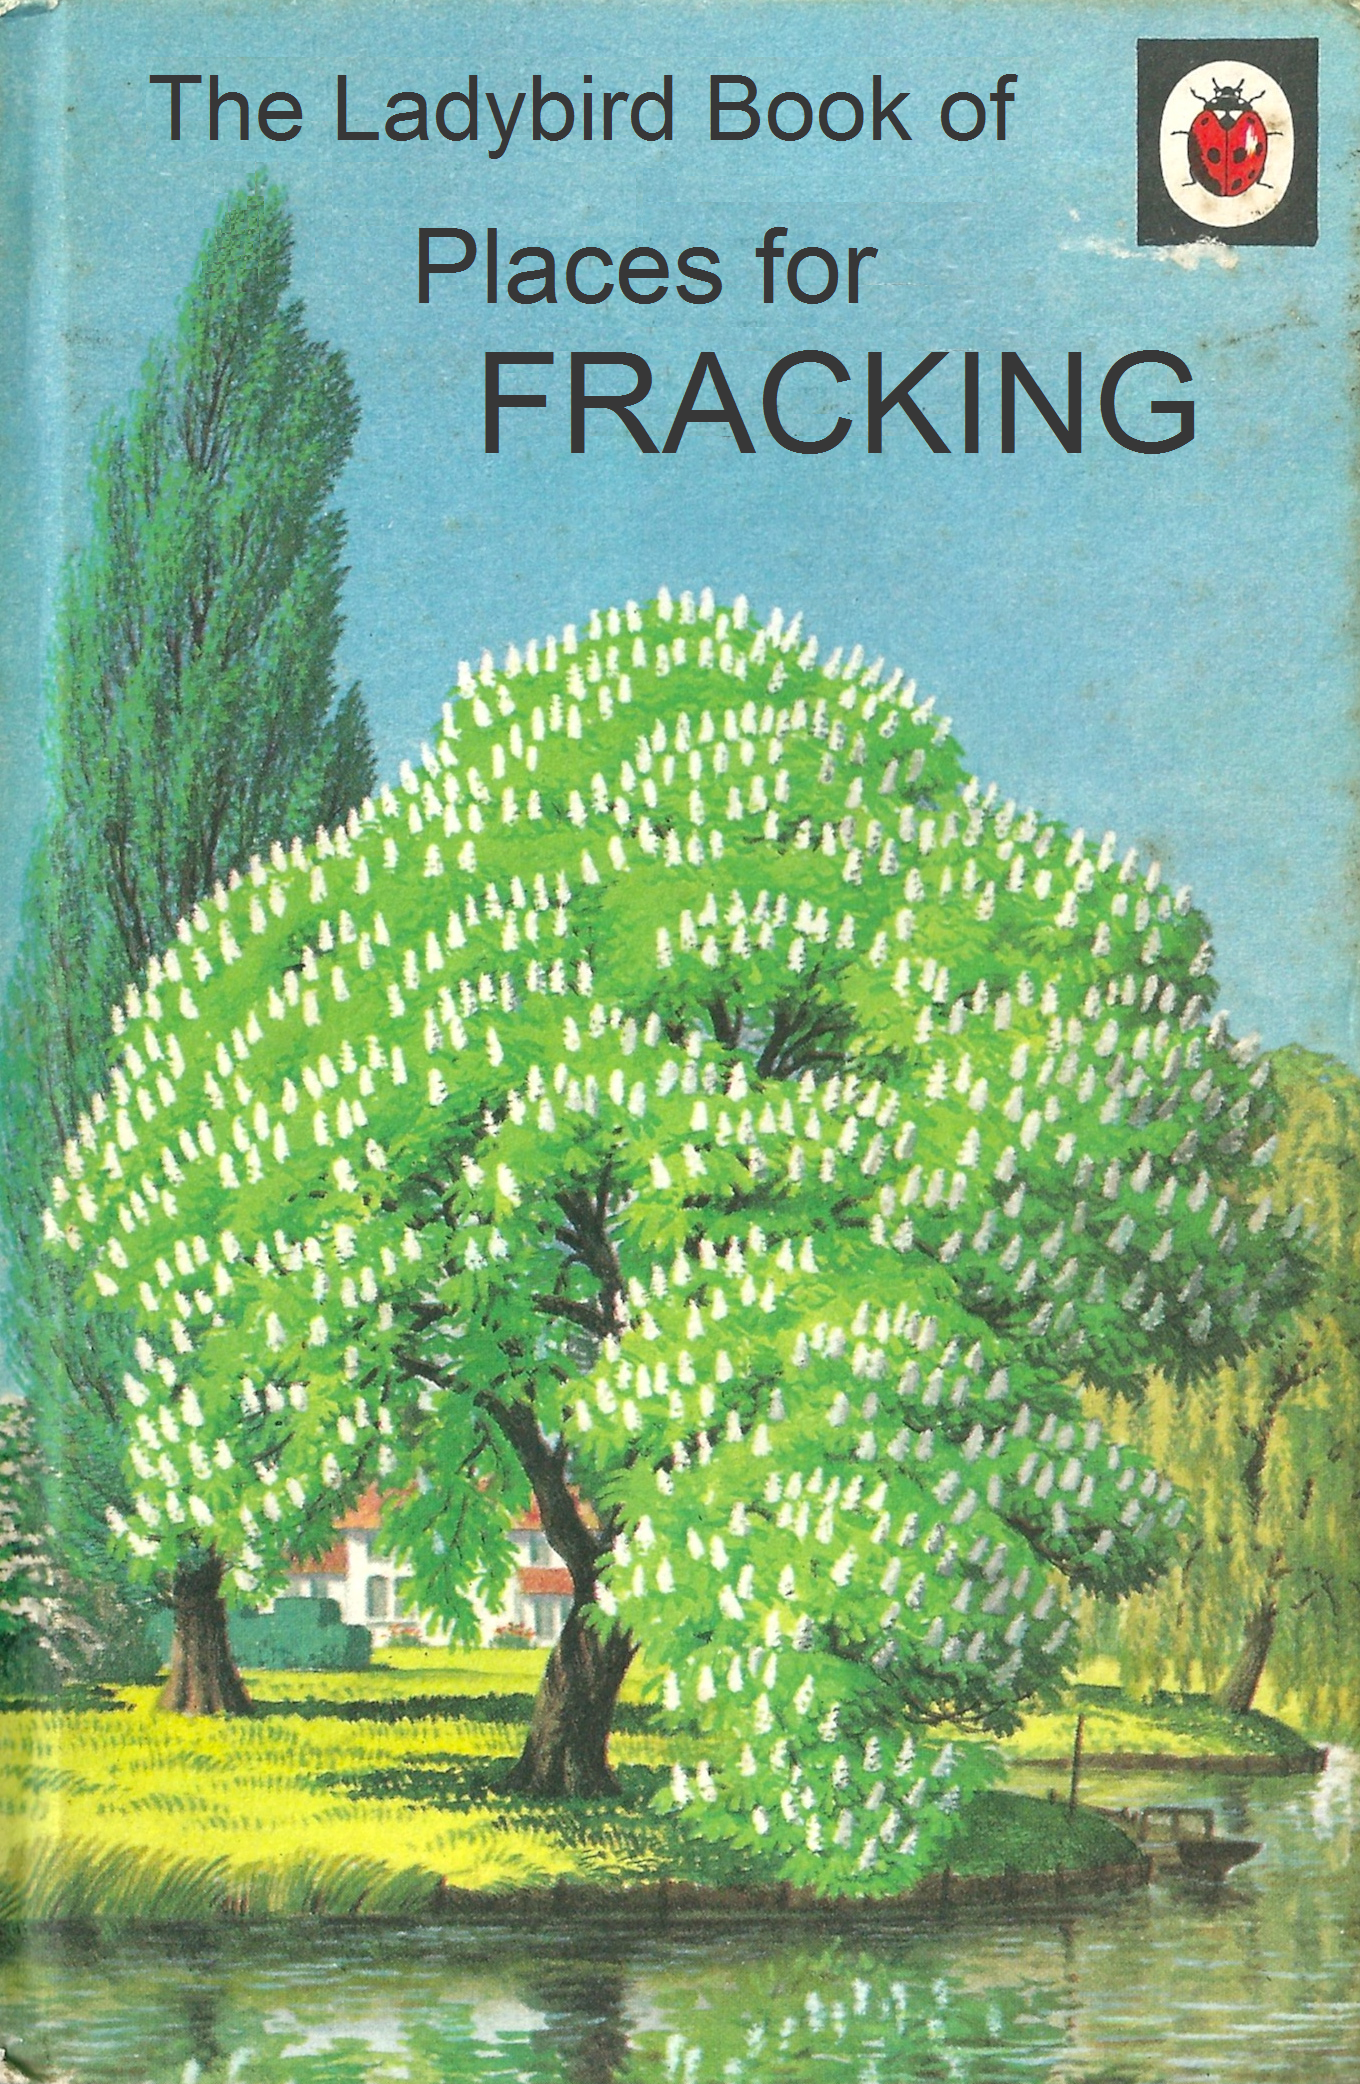 Torychildrensbooks